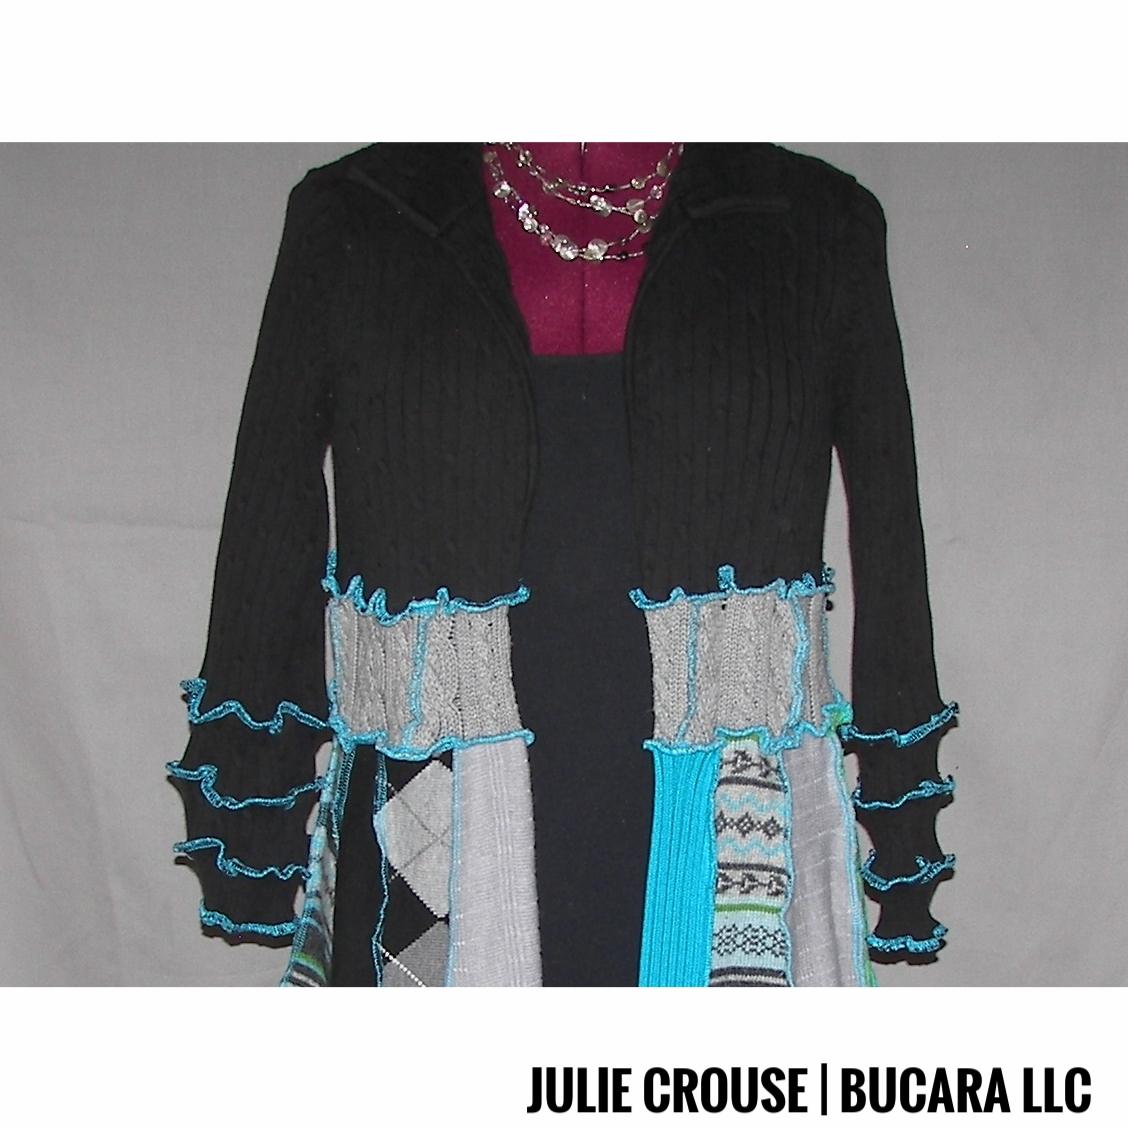 Julie Crouse | Bucara LLC